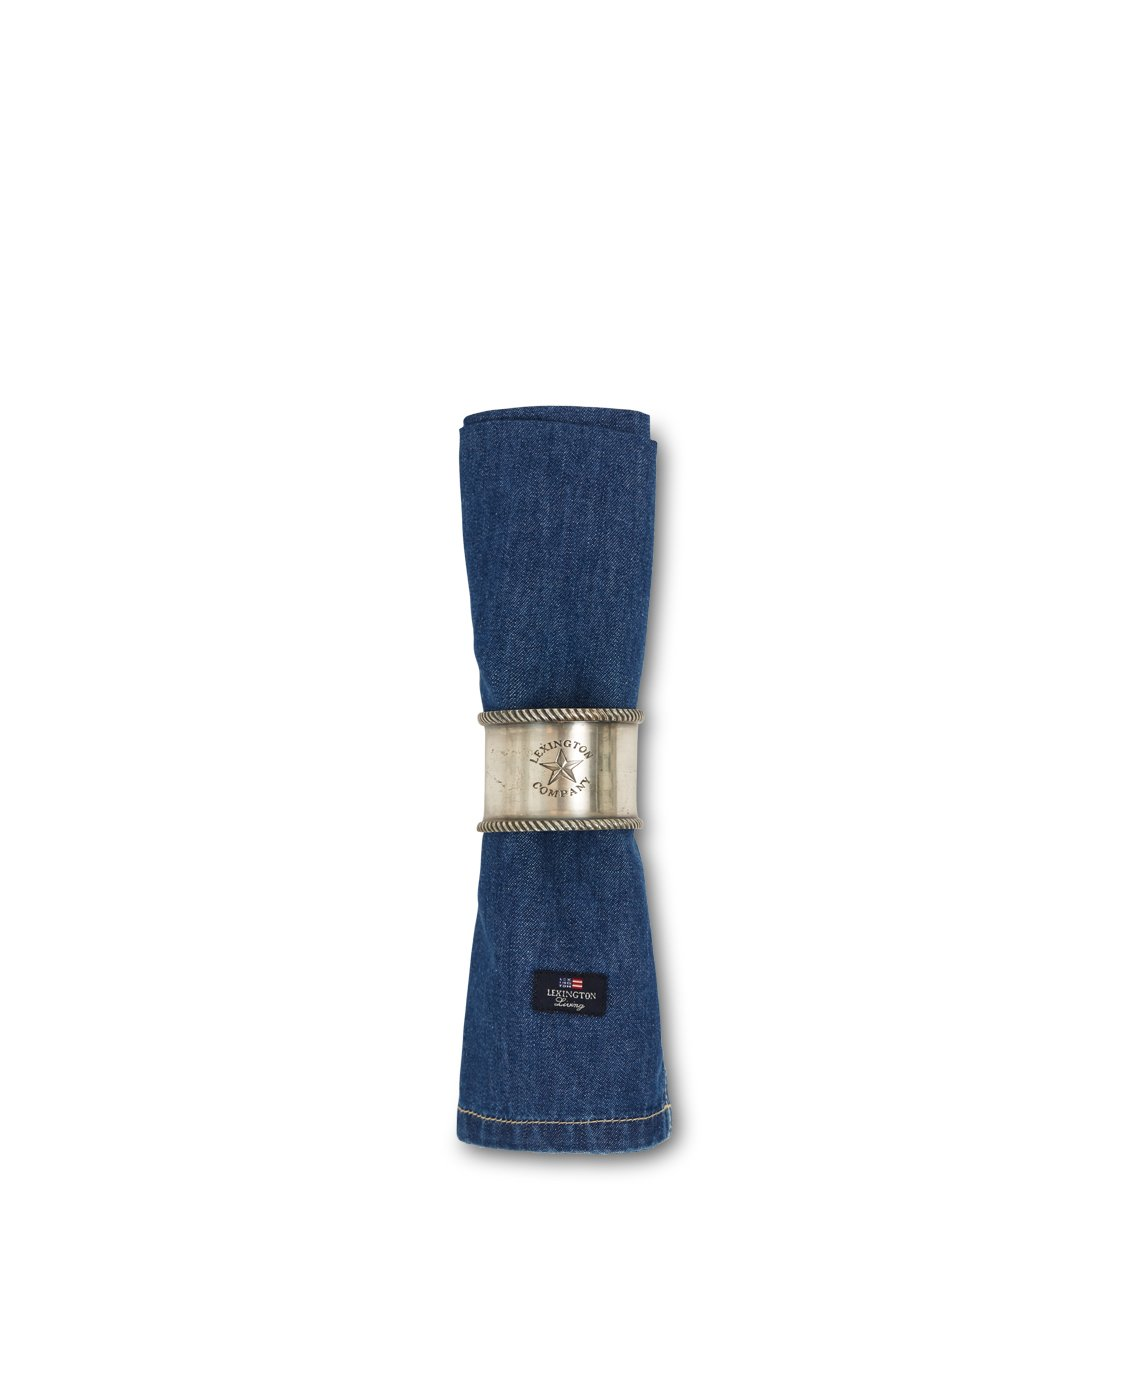 Servietten aus Jeans von Lexington